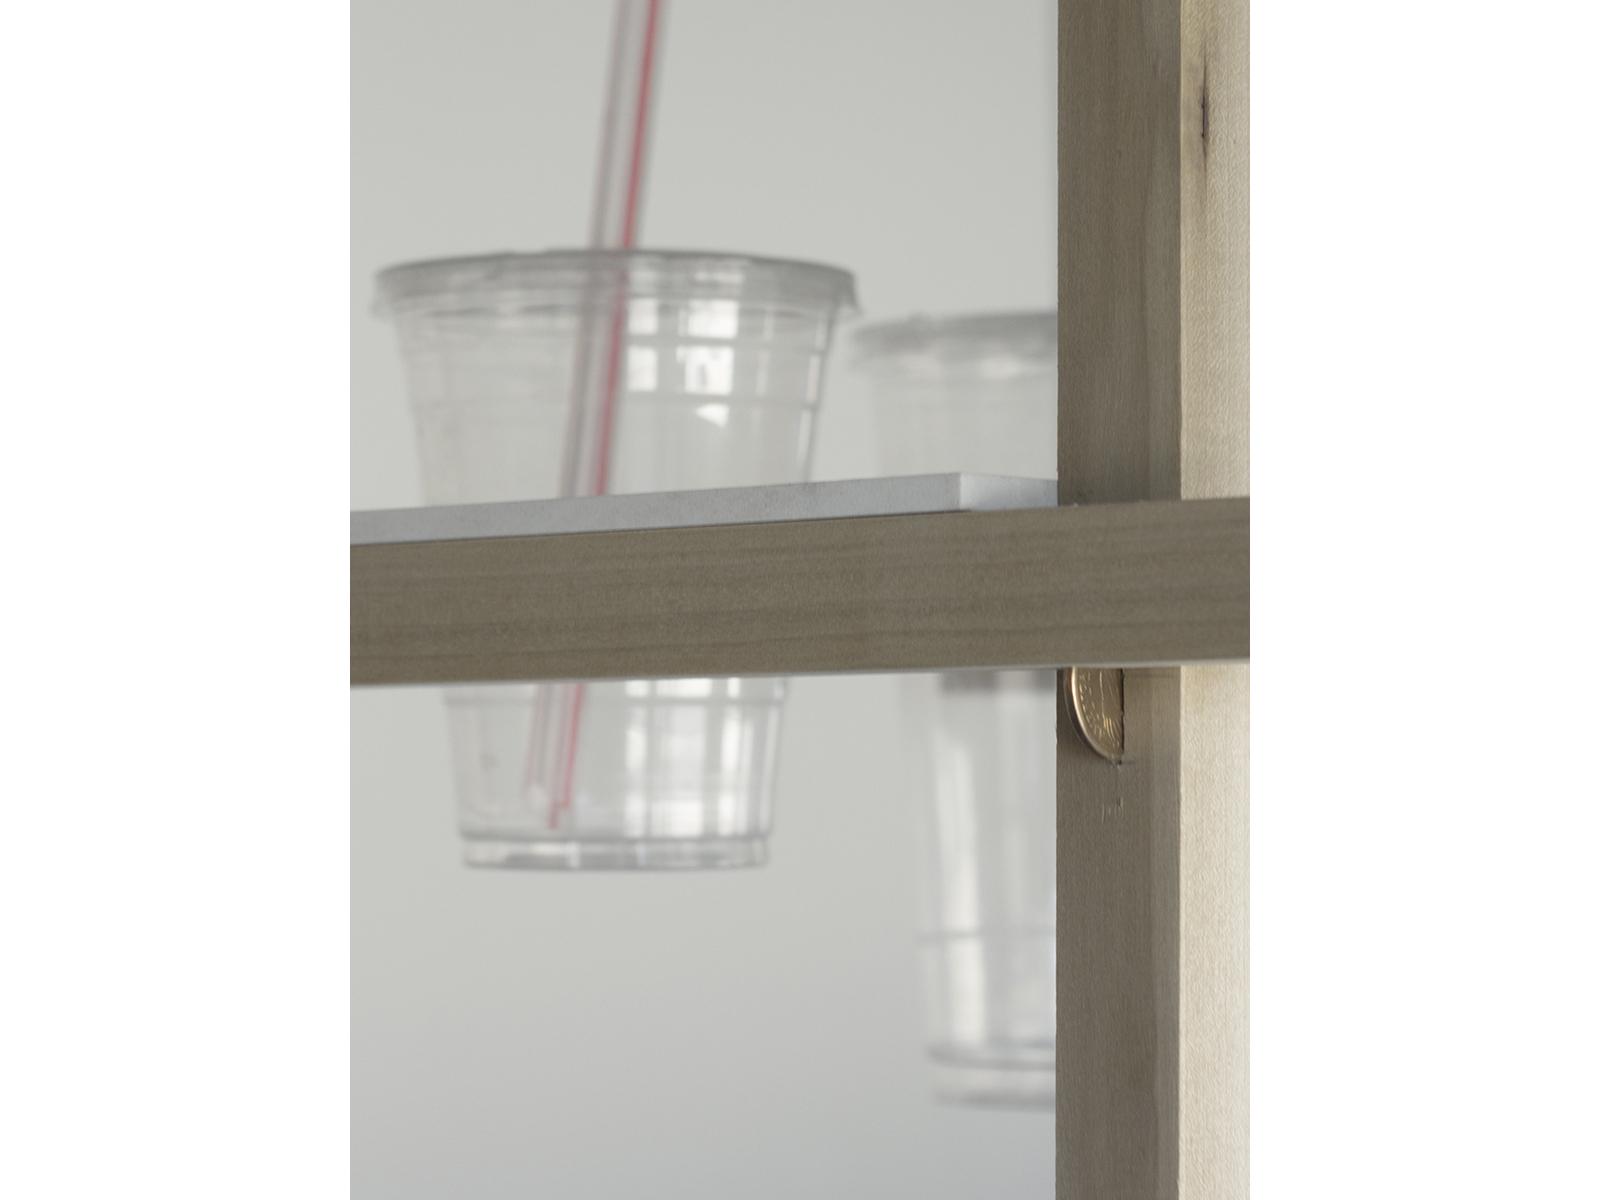 Benoit-Delaunay-artiste-installations-2013-A Set of Valuable Skills-sculpture-detail-03